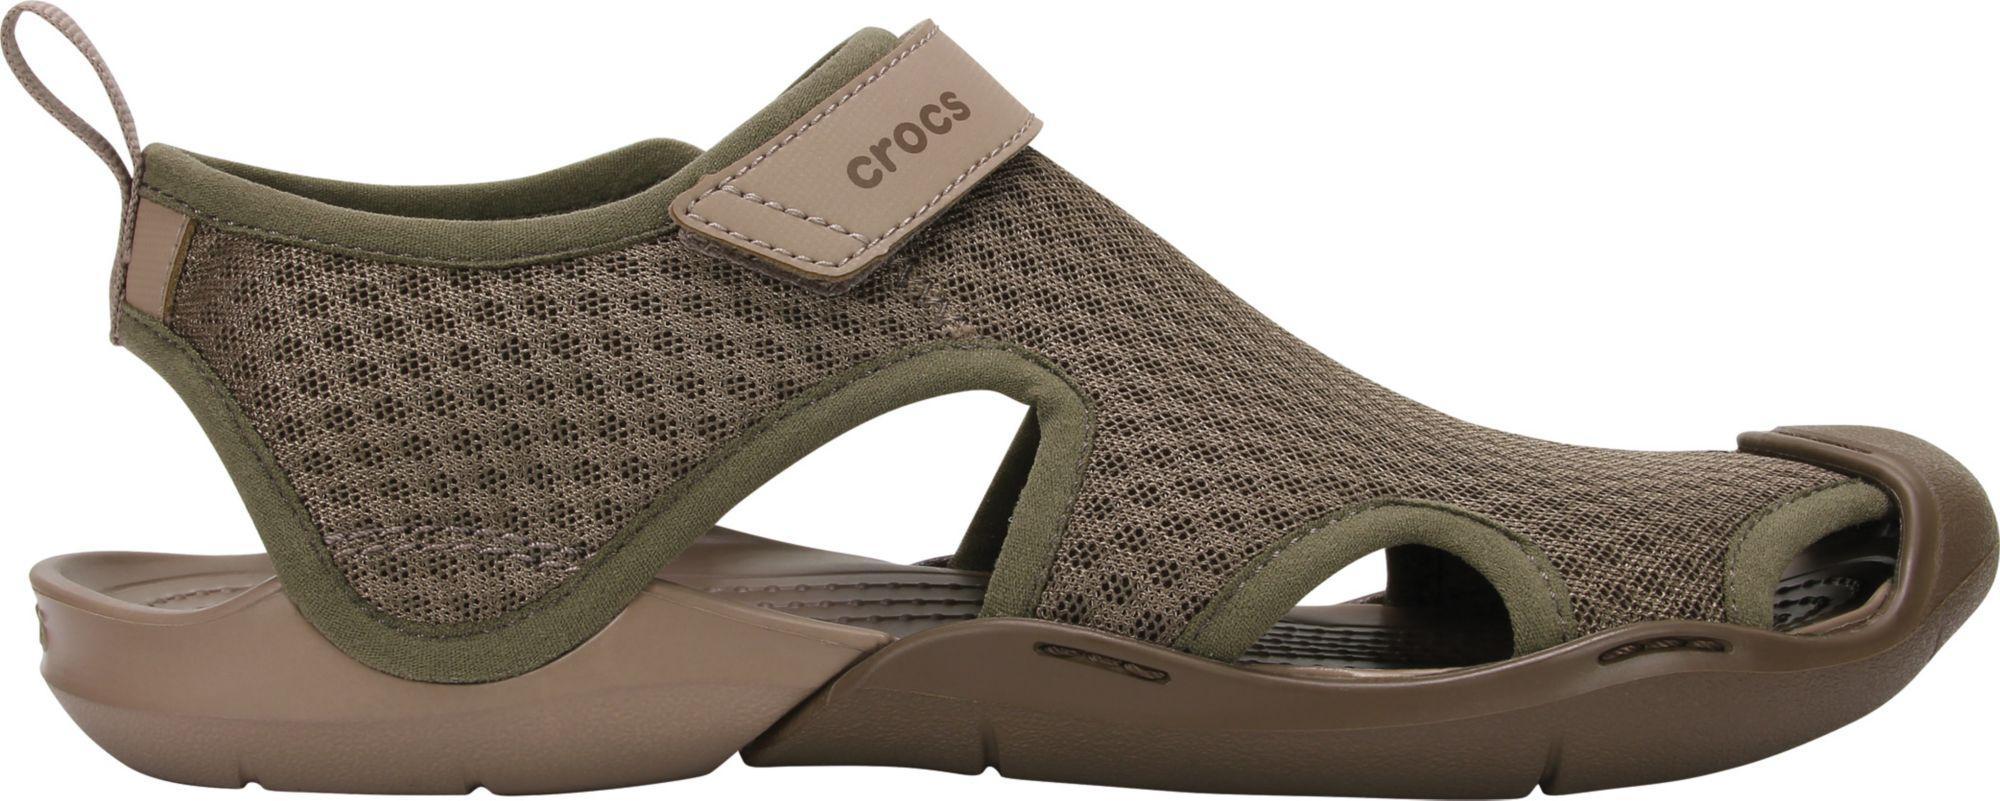 a6d96b99ab82b Crocs™ - Multicolor Swiftwater Mesh Sandals - Lyst